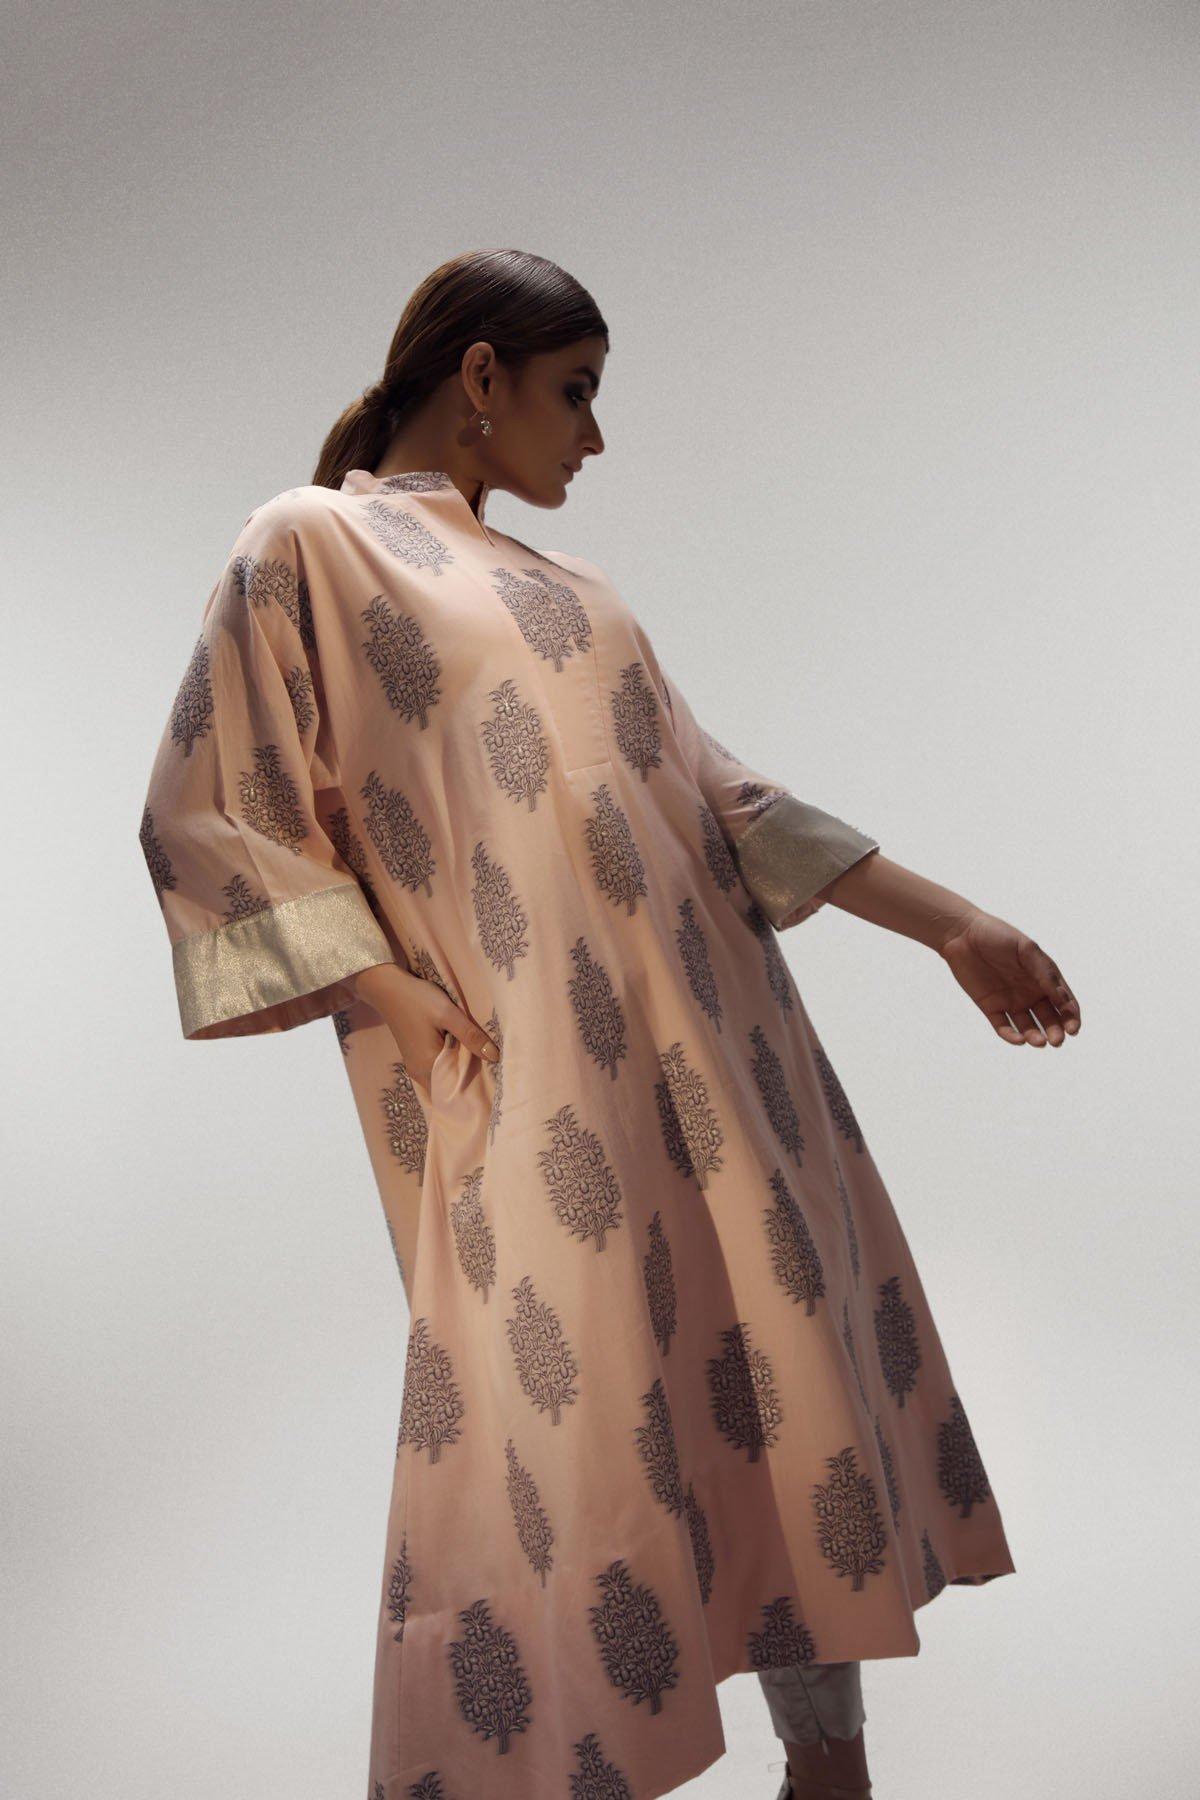 /2019/02/alkaram-studio-catalyst-collection-dyed-jacquard-shirt-image1.jpg